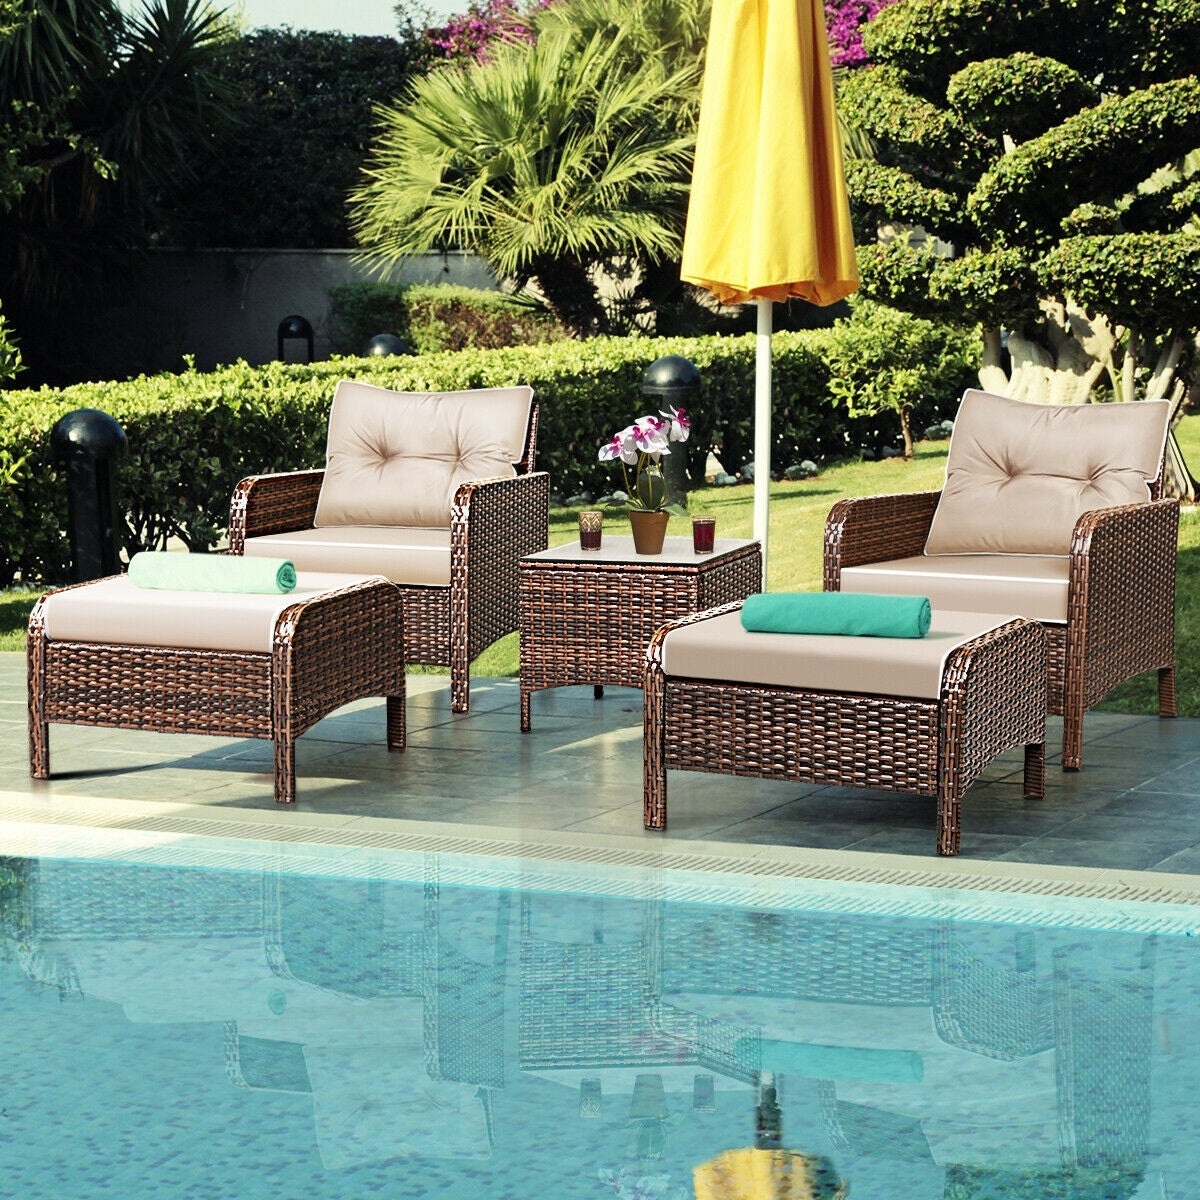 Costway 5 pcs rattan wicker furniture set sofa ottoman w brown cushion patio garden yard as pic